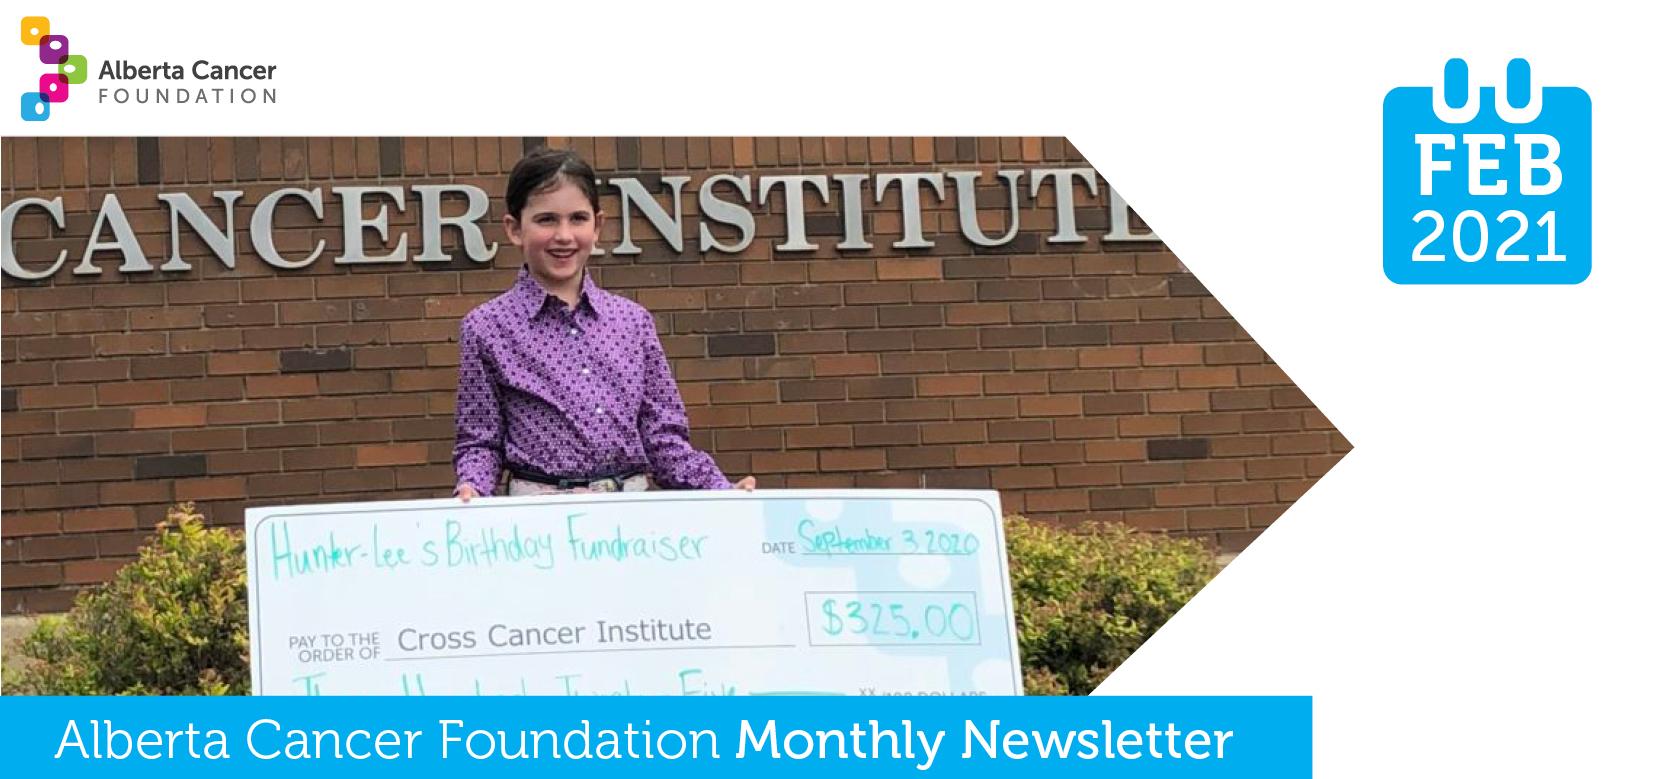 Alberta Cancer Foundation Monthly News